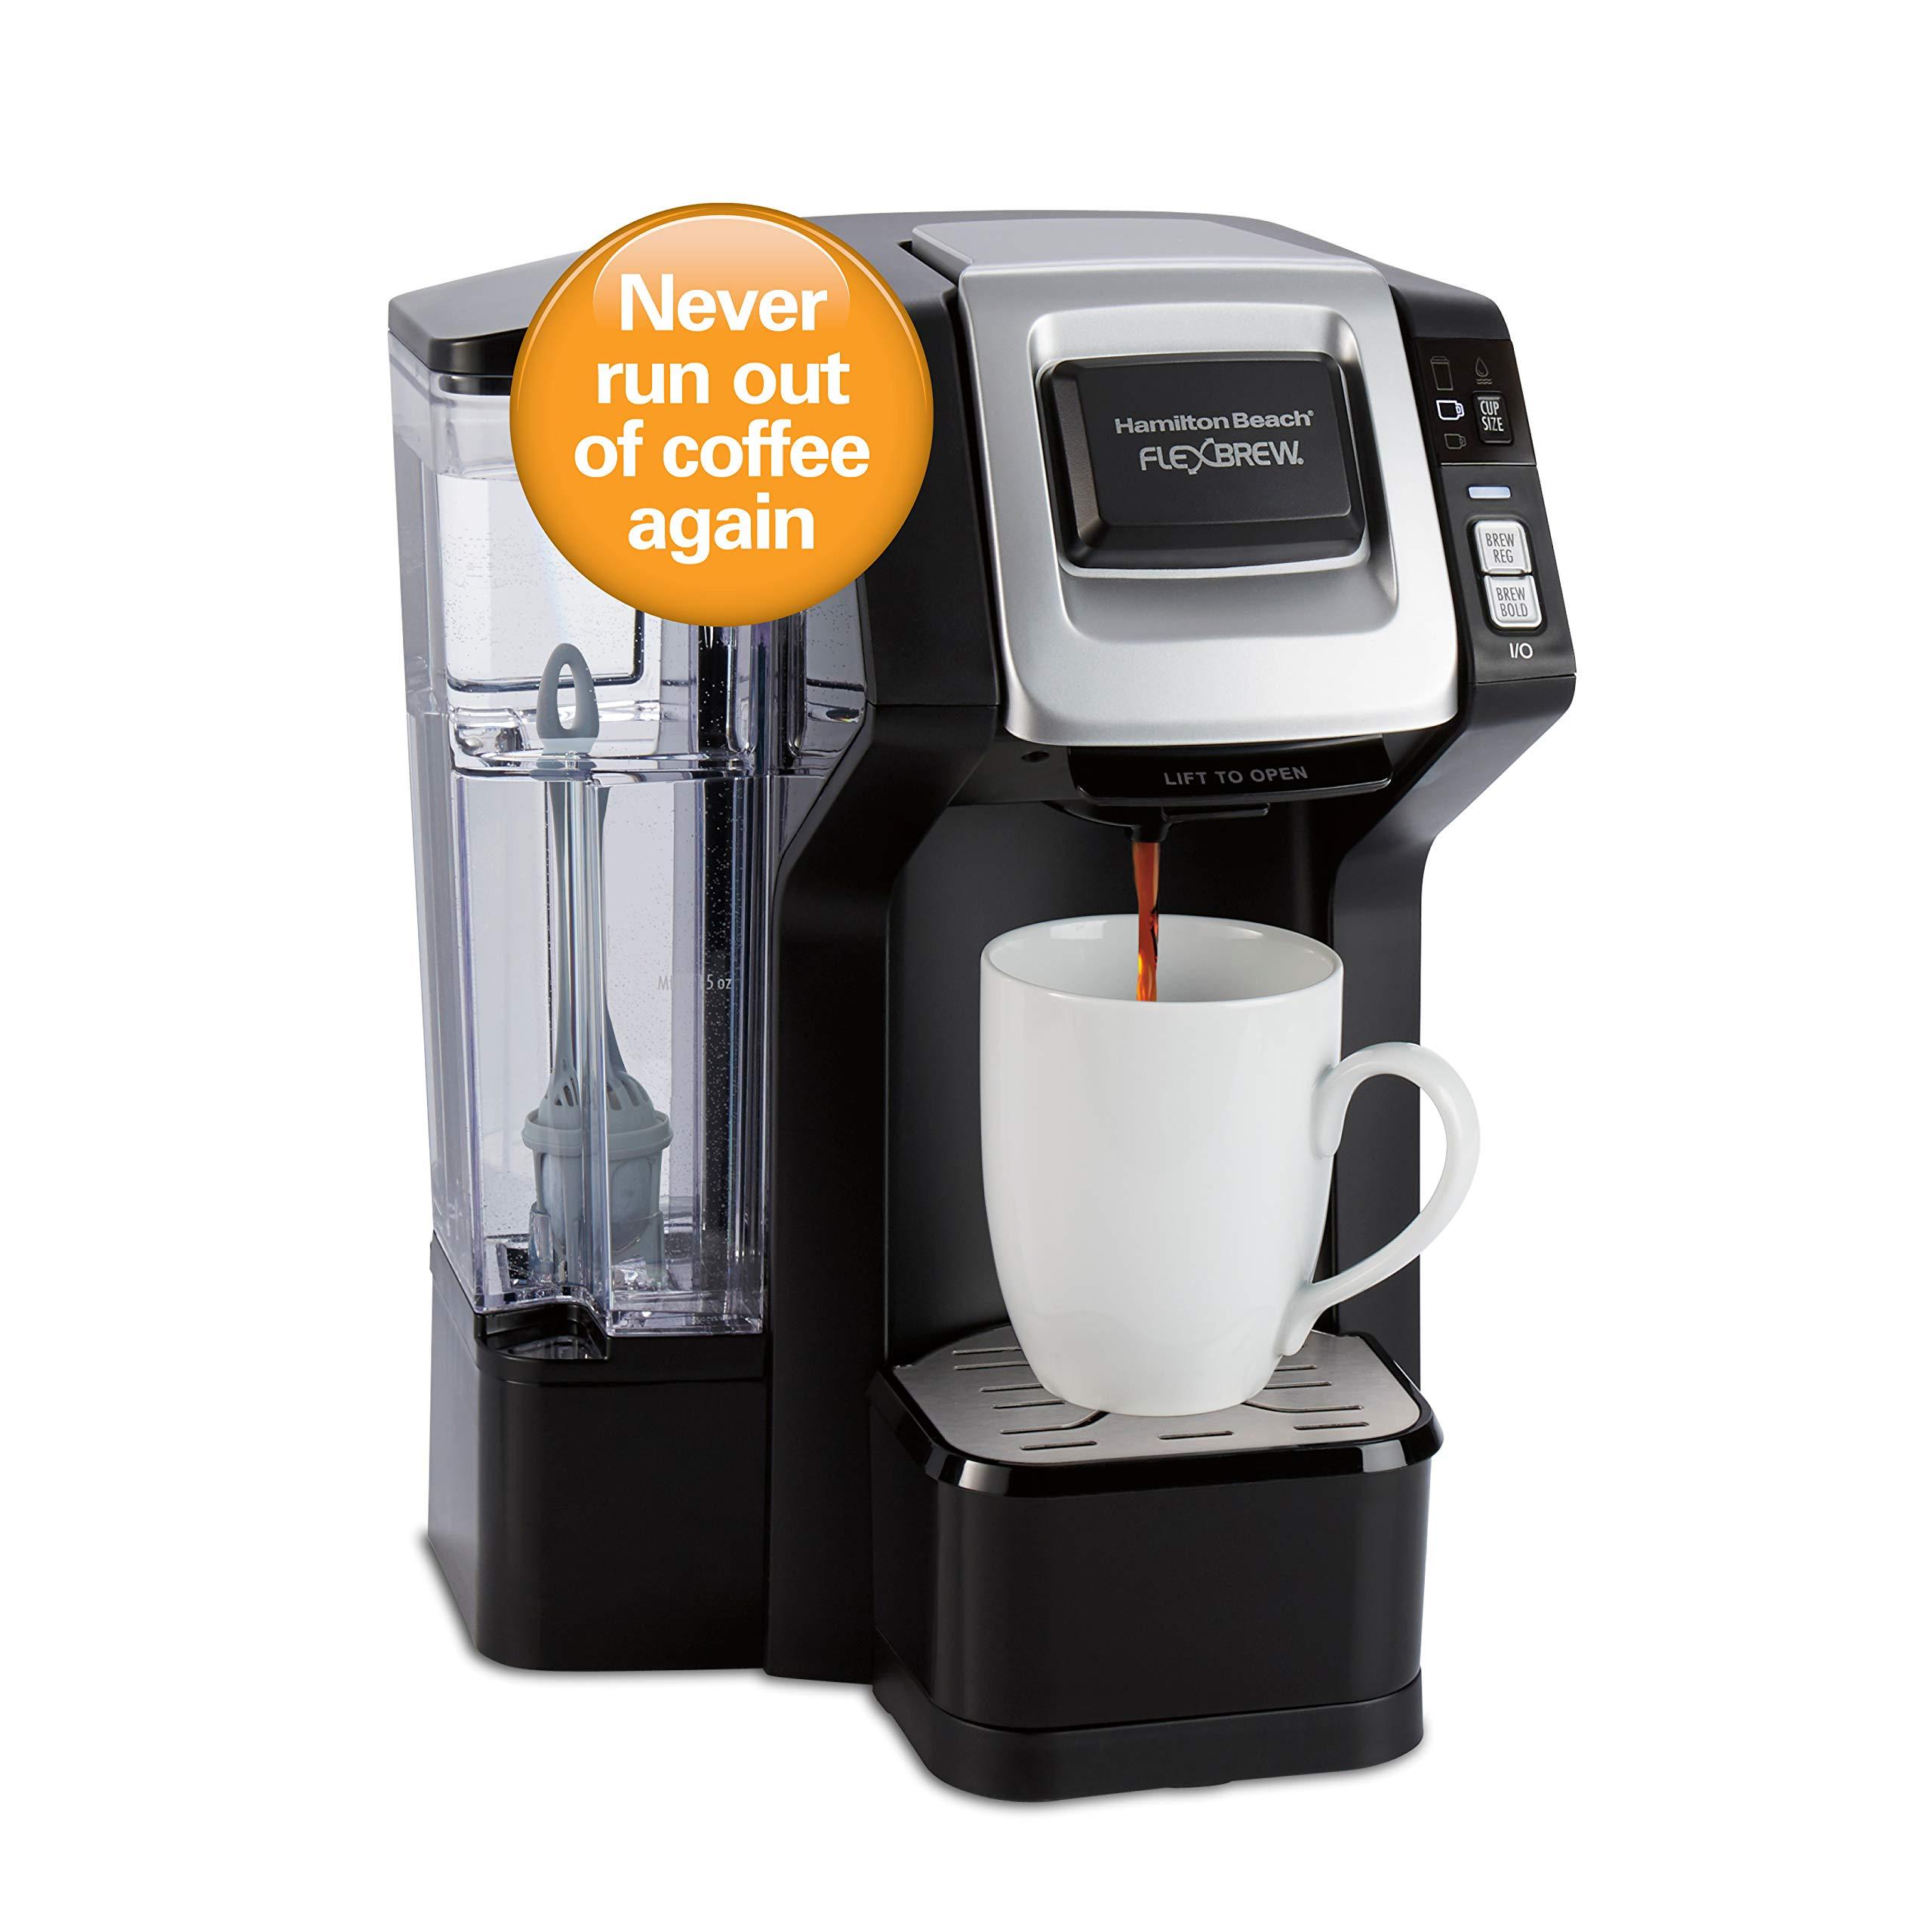 Hamilton Beach 49968 FlexBrew Connected Single Cup Coffee Maker with Amazon Dash Auto Replenishment for Coffee Pods by Hamilton Beach